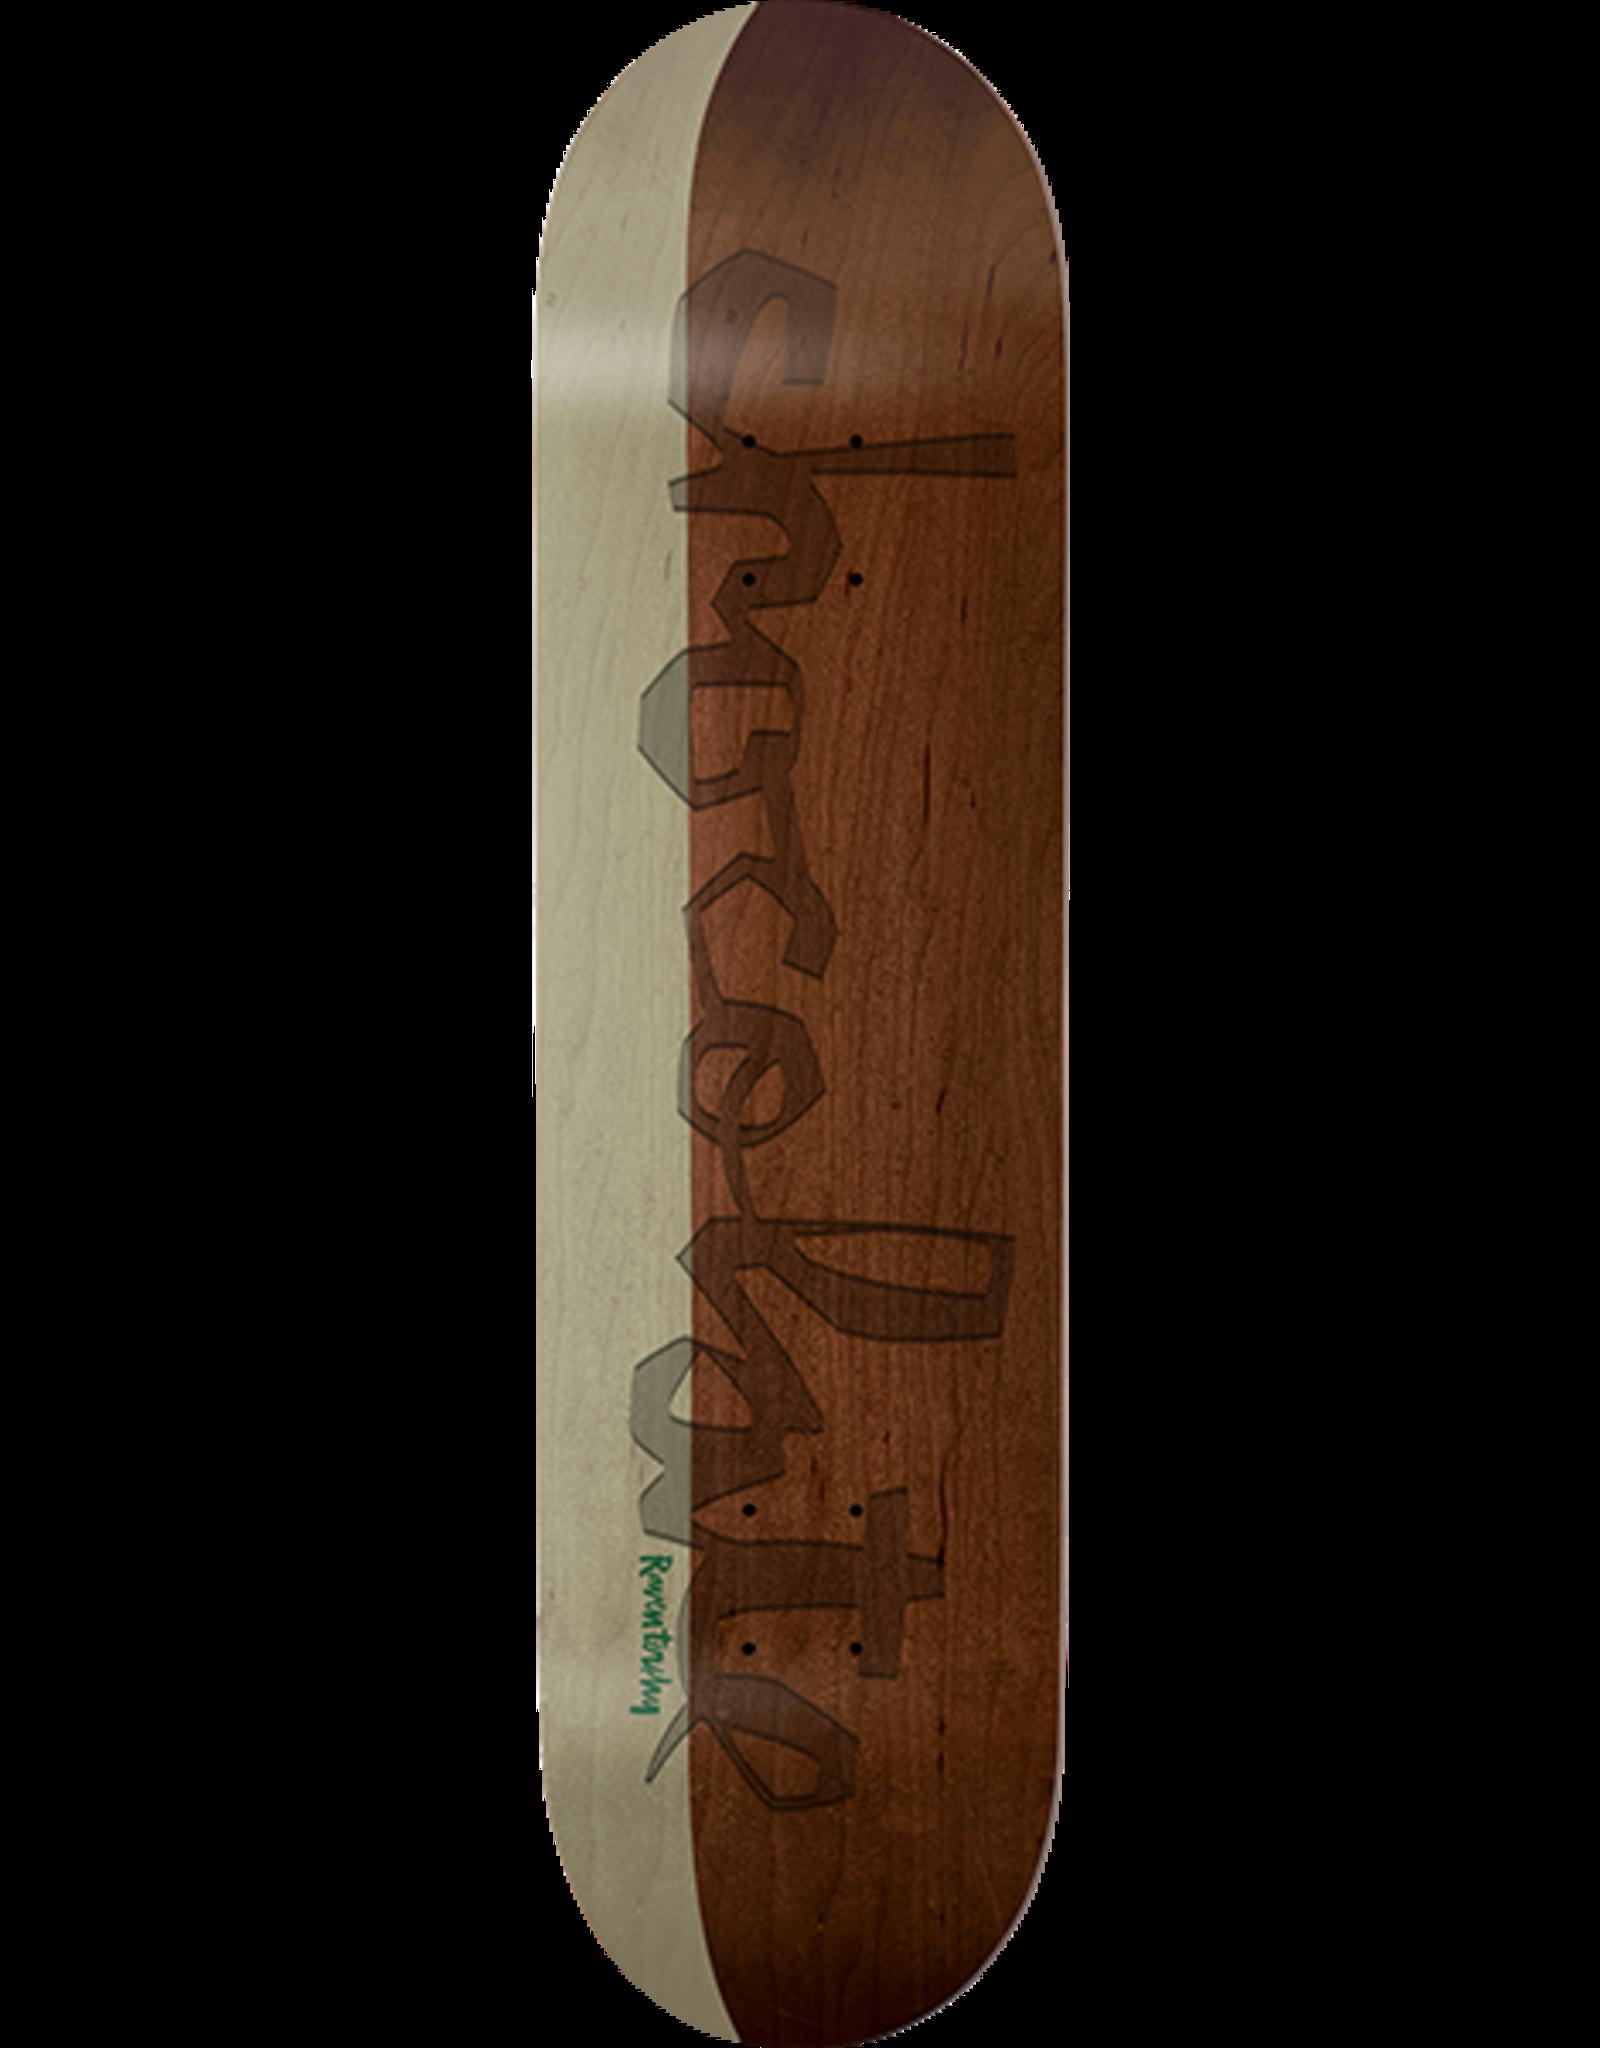 Chocolate Tershy OG Chunk Split Deck - 8.25